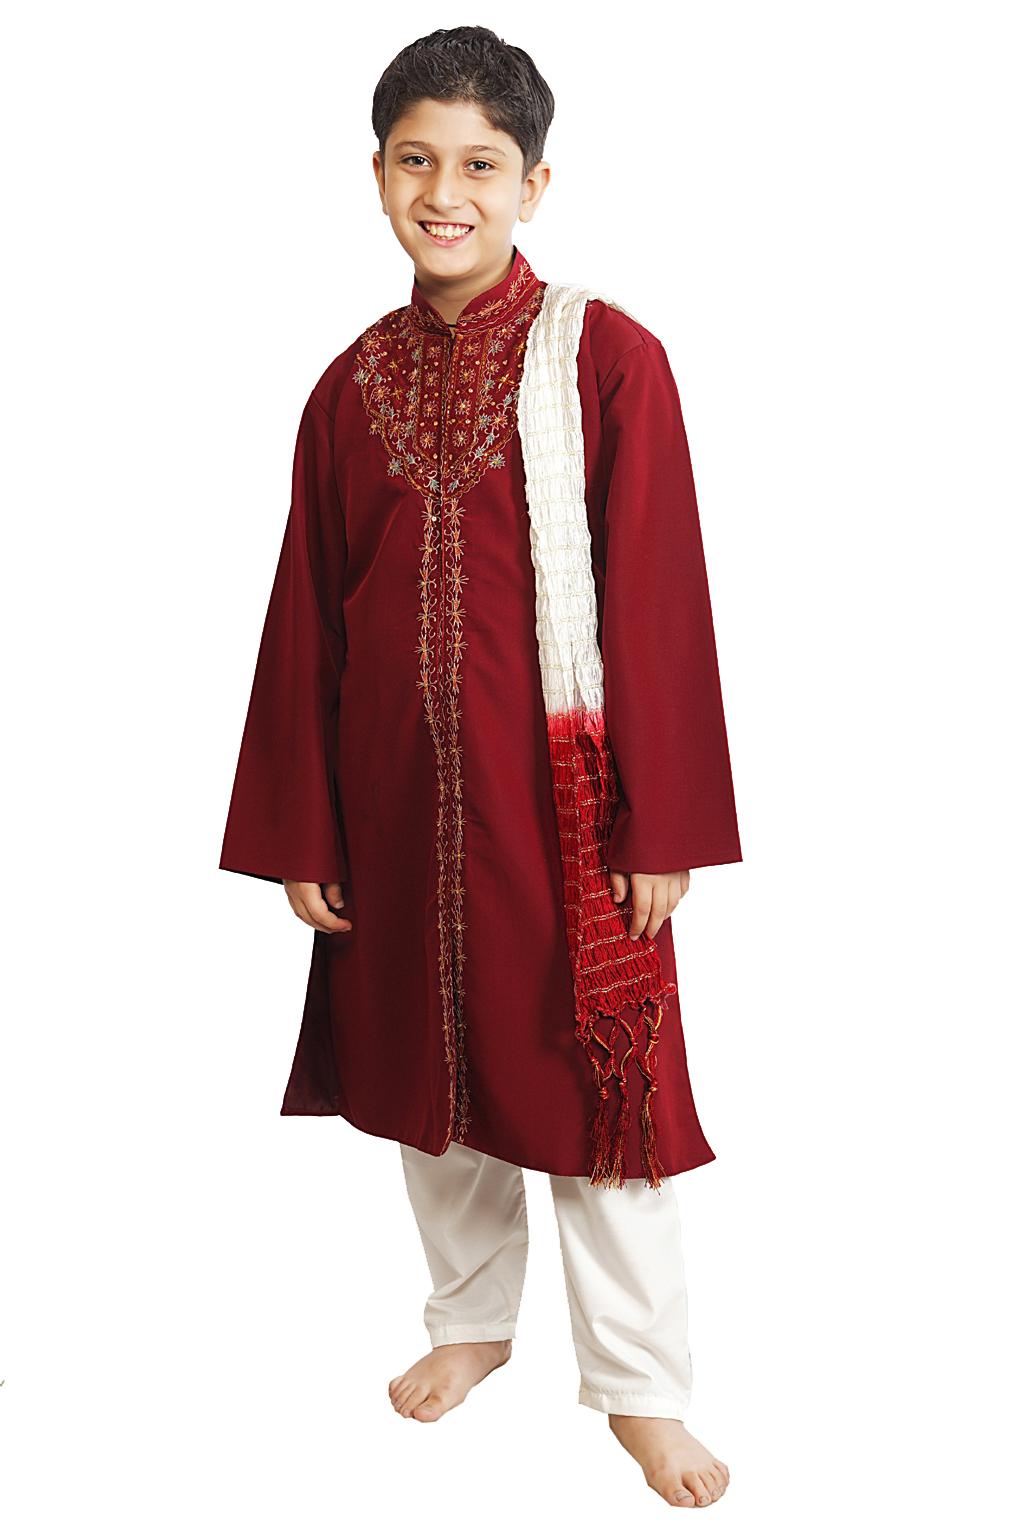 Dress code for men in Islam